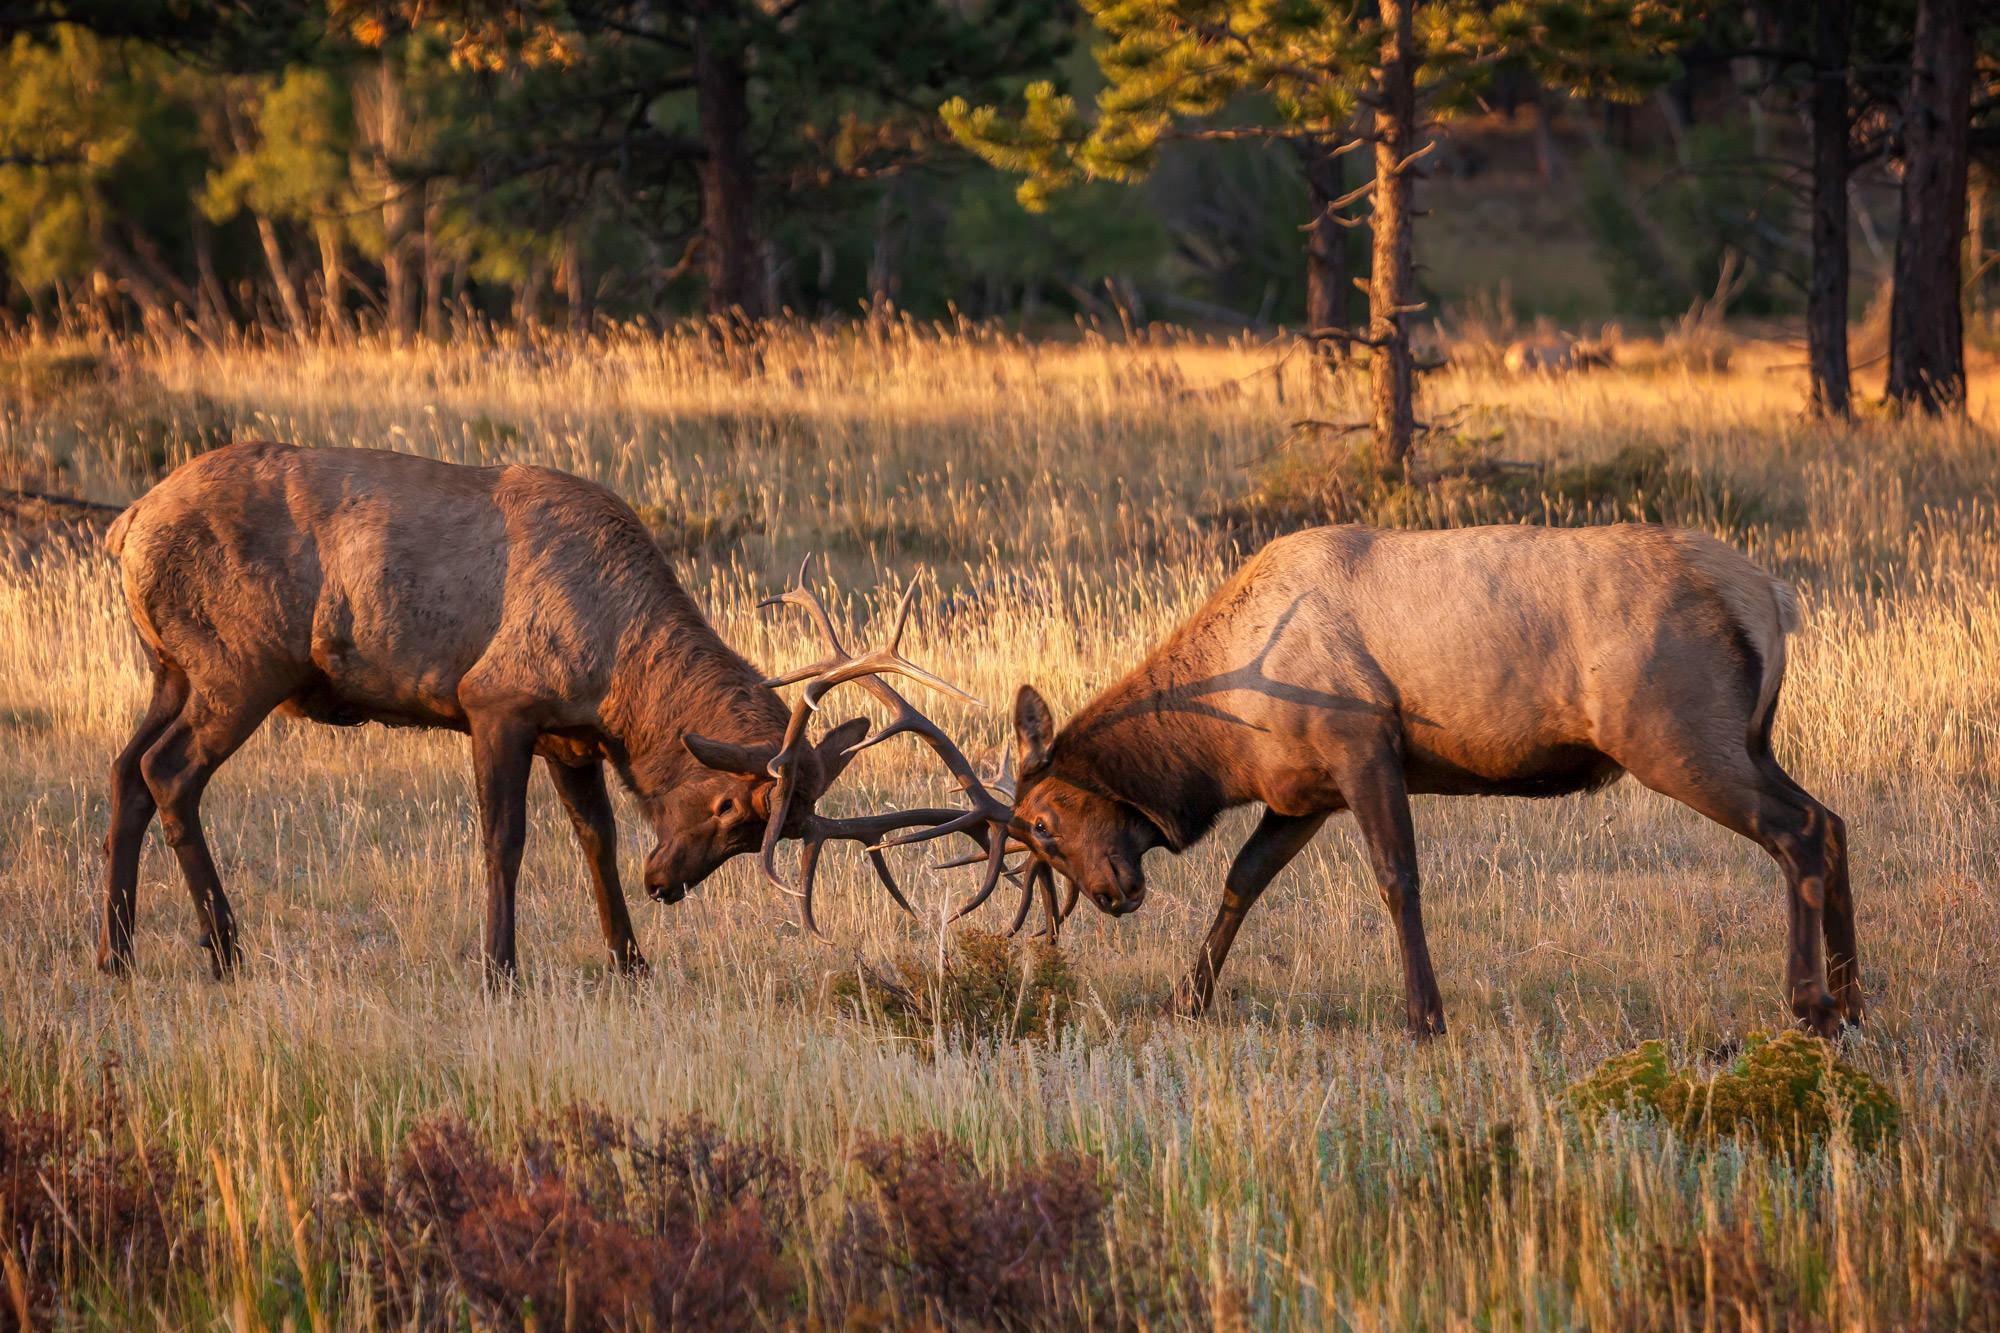 Elk, Bull Elk, Colorado, Rocky Mountain, National Park, limited edition, photograph, fine art, wildlife, photo